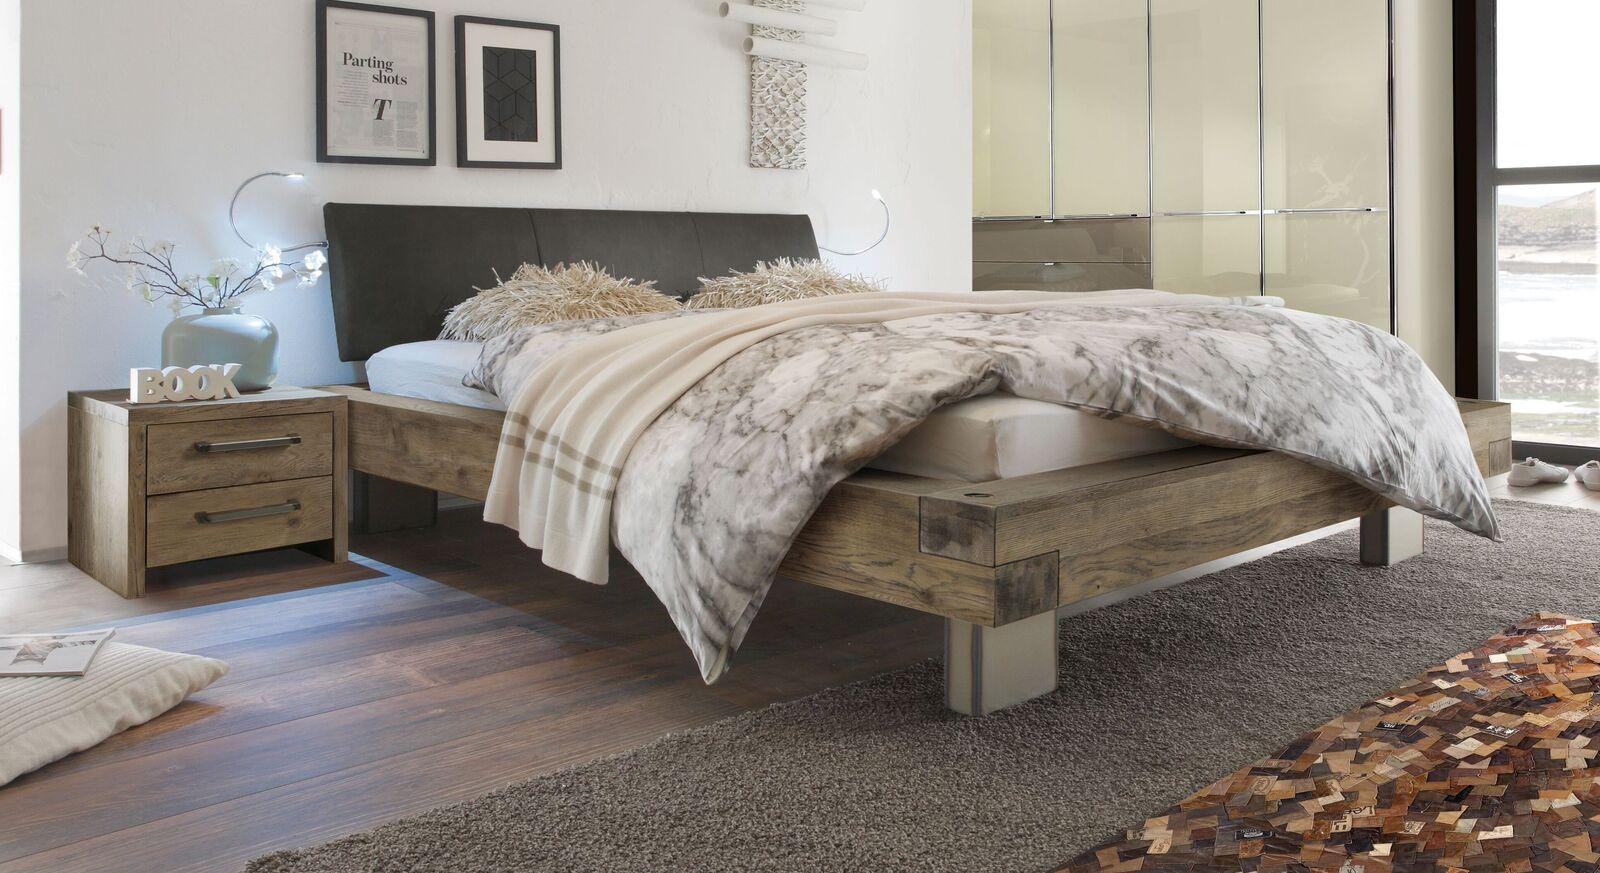 Holzbett Limeira in Terrabraun mit anthrazitfarbenem Luxus-Kunstleder